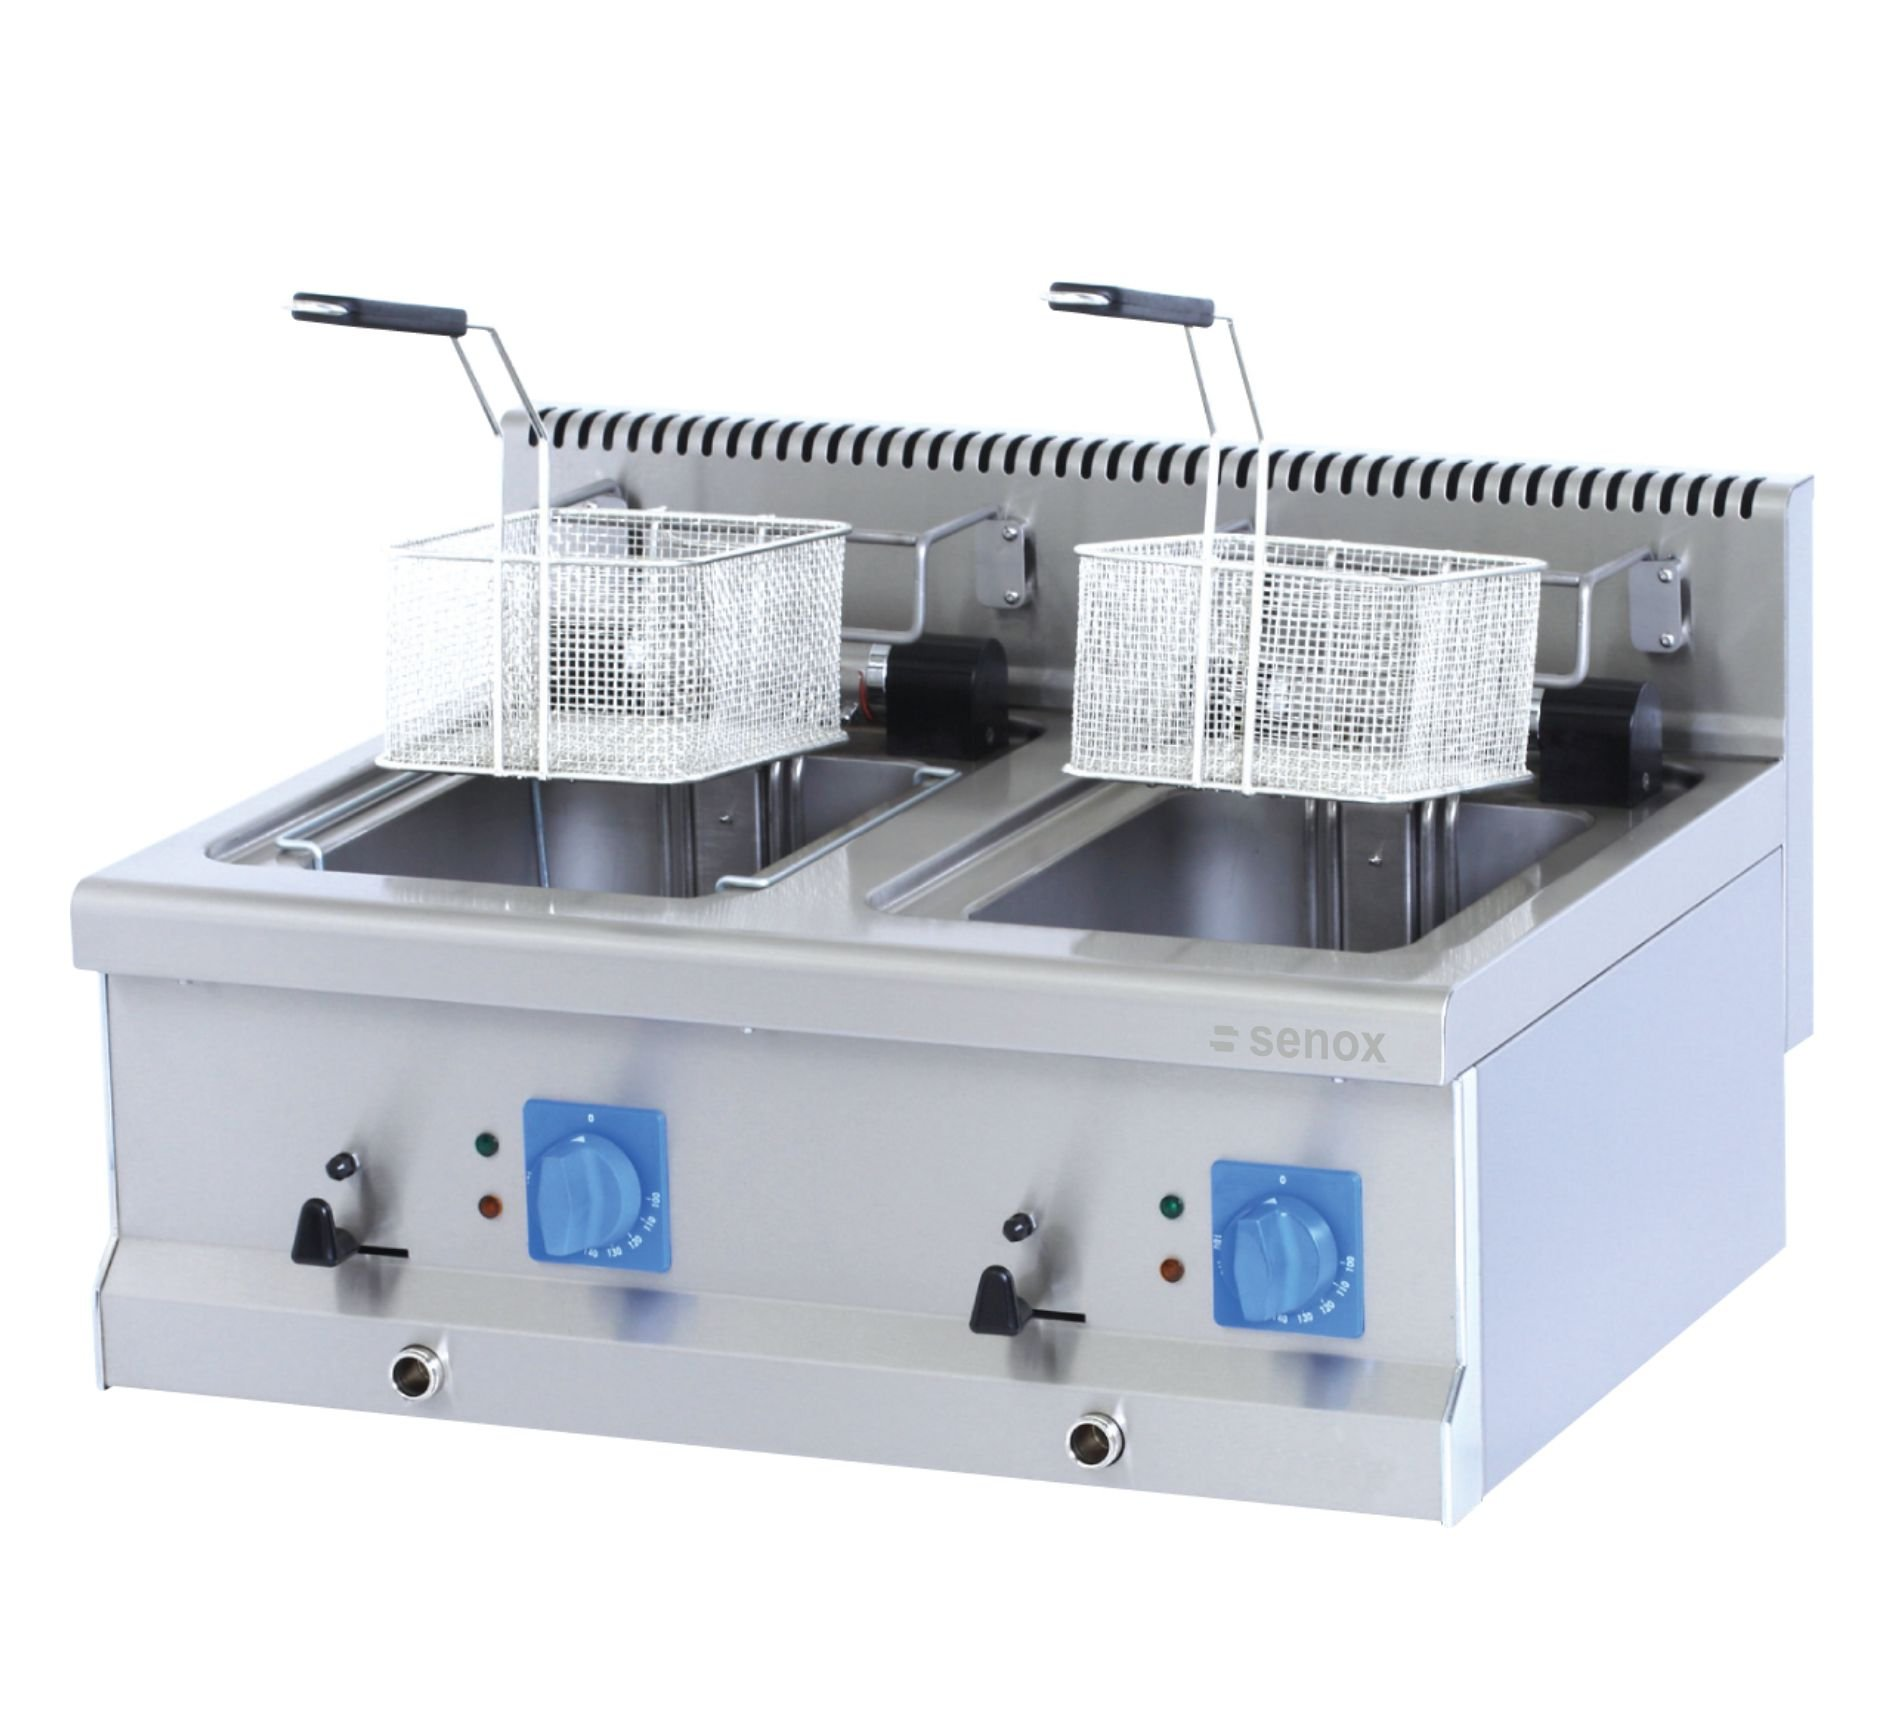 senox-aef-860-elektrikli-fritoz